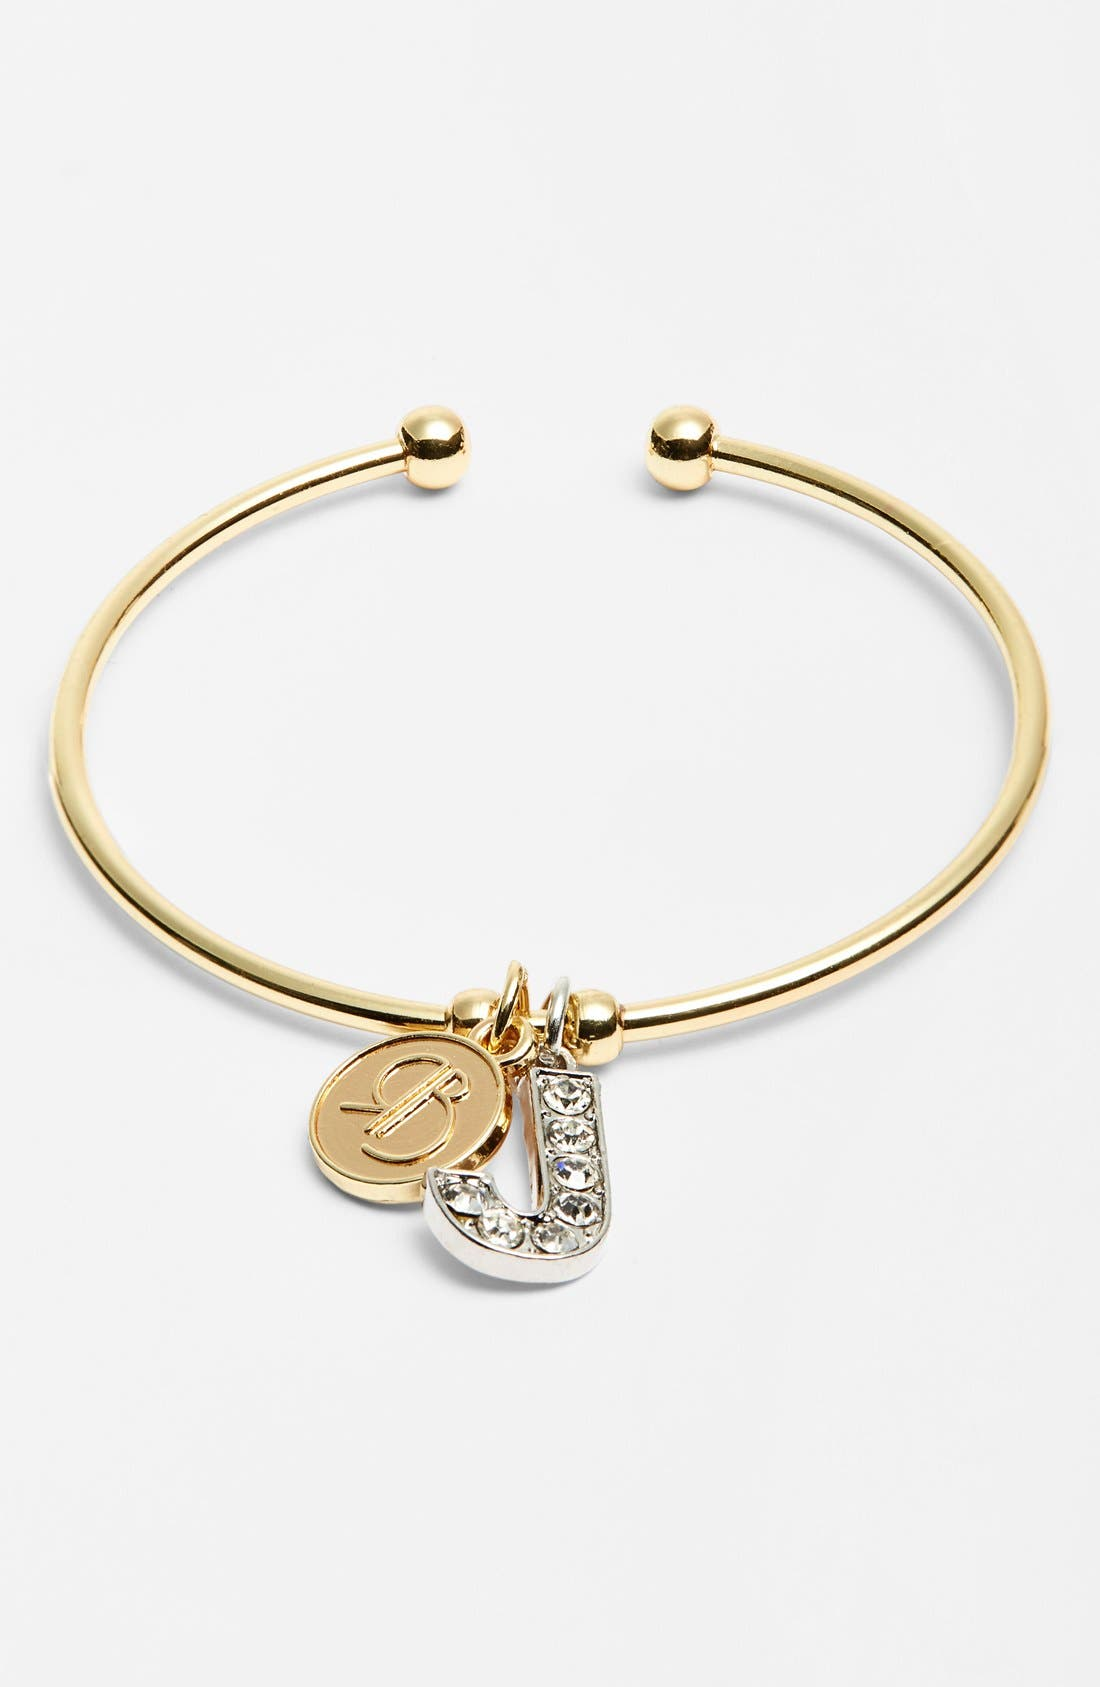 Main Image - Rolf Bleu 'Madison - Initial' Bracelet